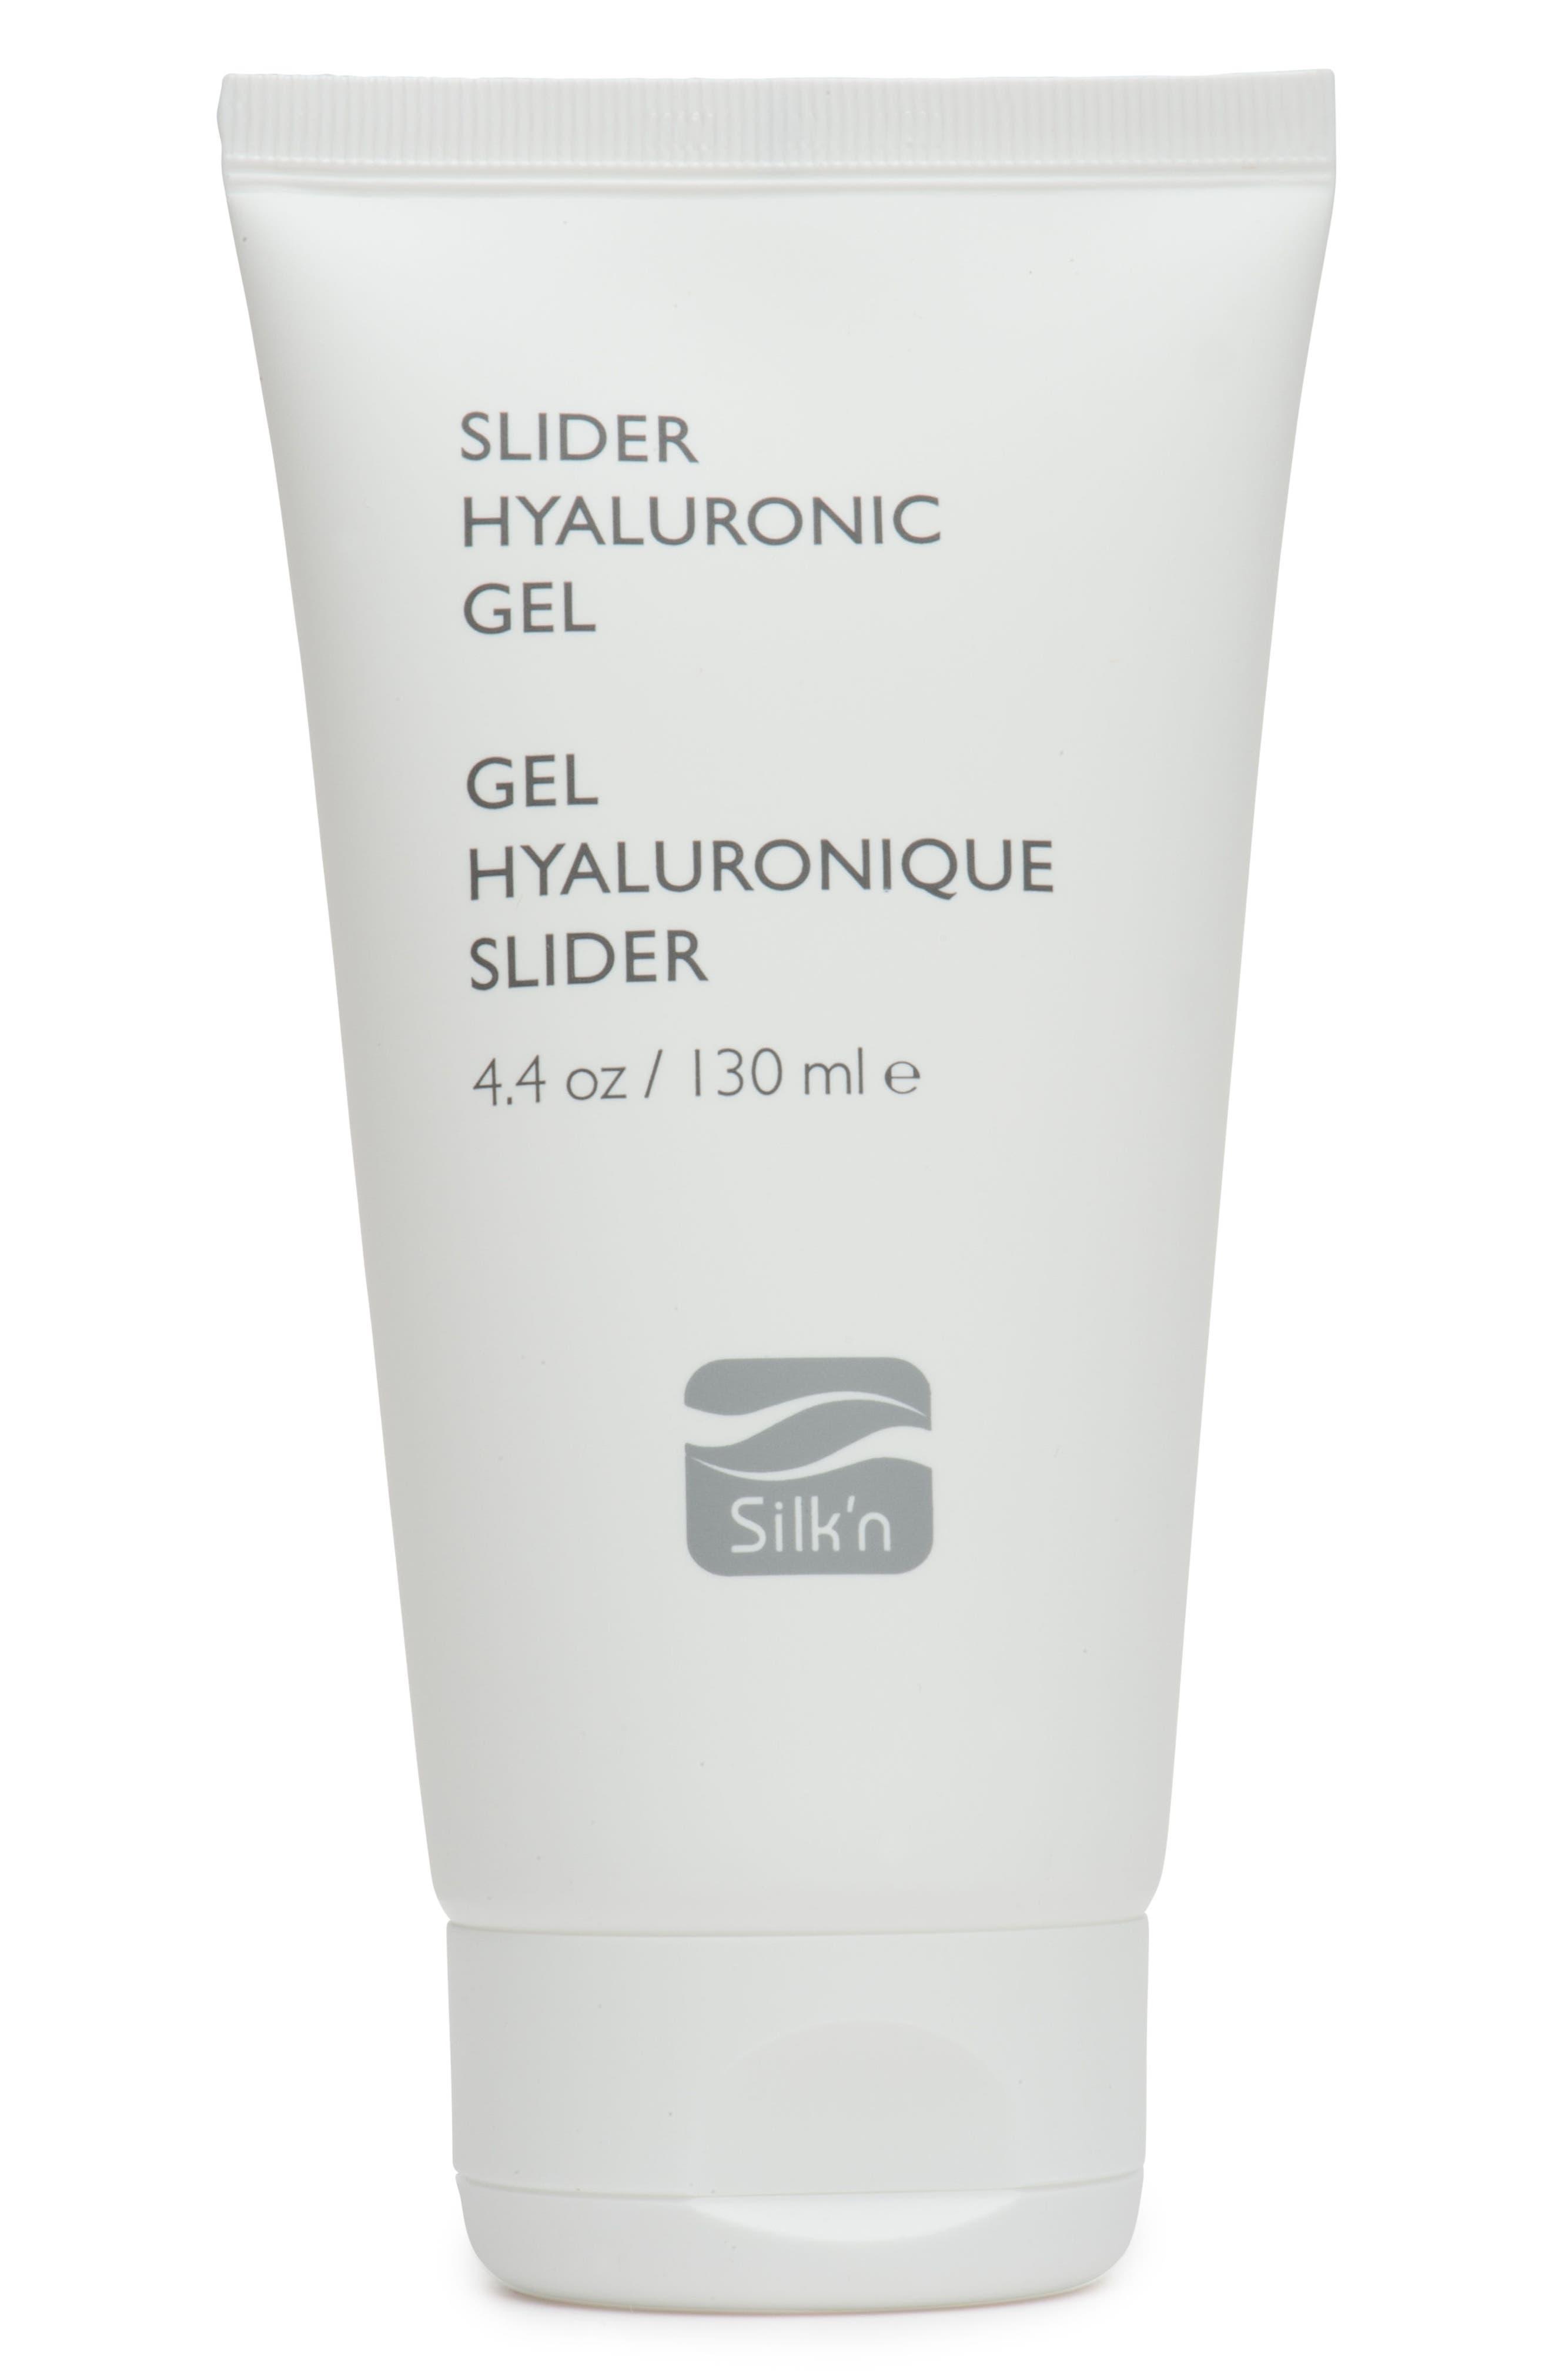 Alternate Image 1 Selected - Silk'n Slider Hyaluronic Gel